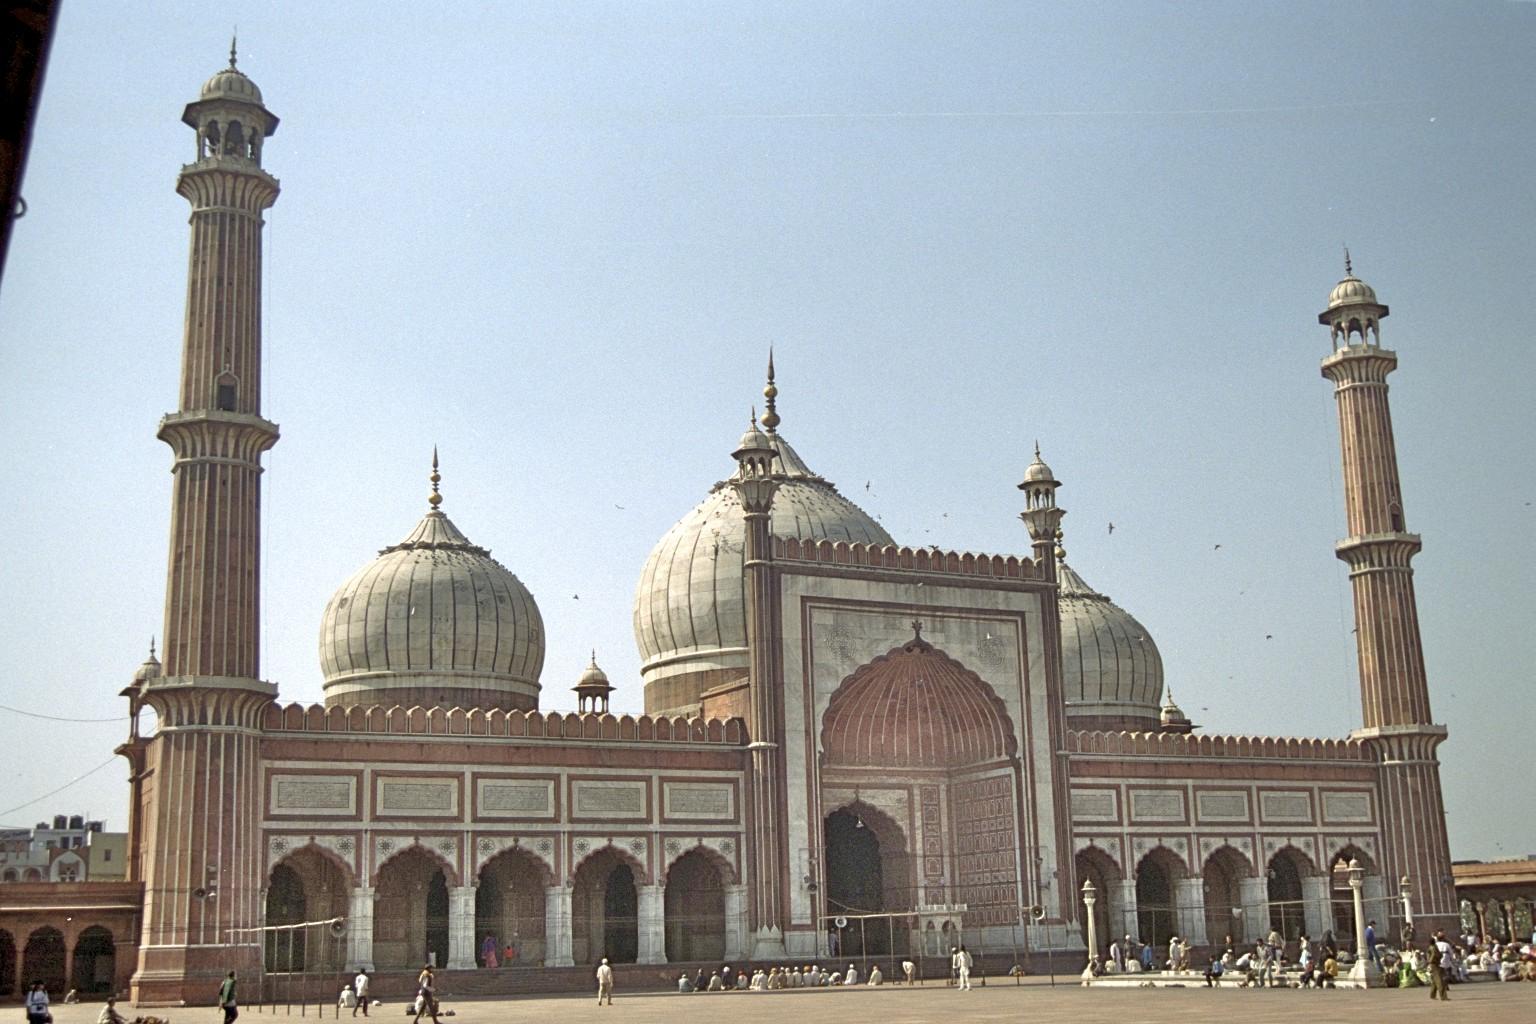 Jama Masjid moska, Delhi 2